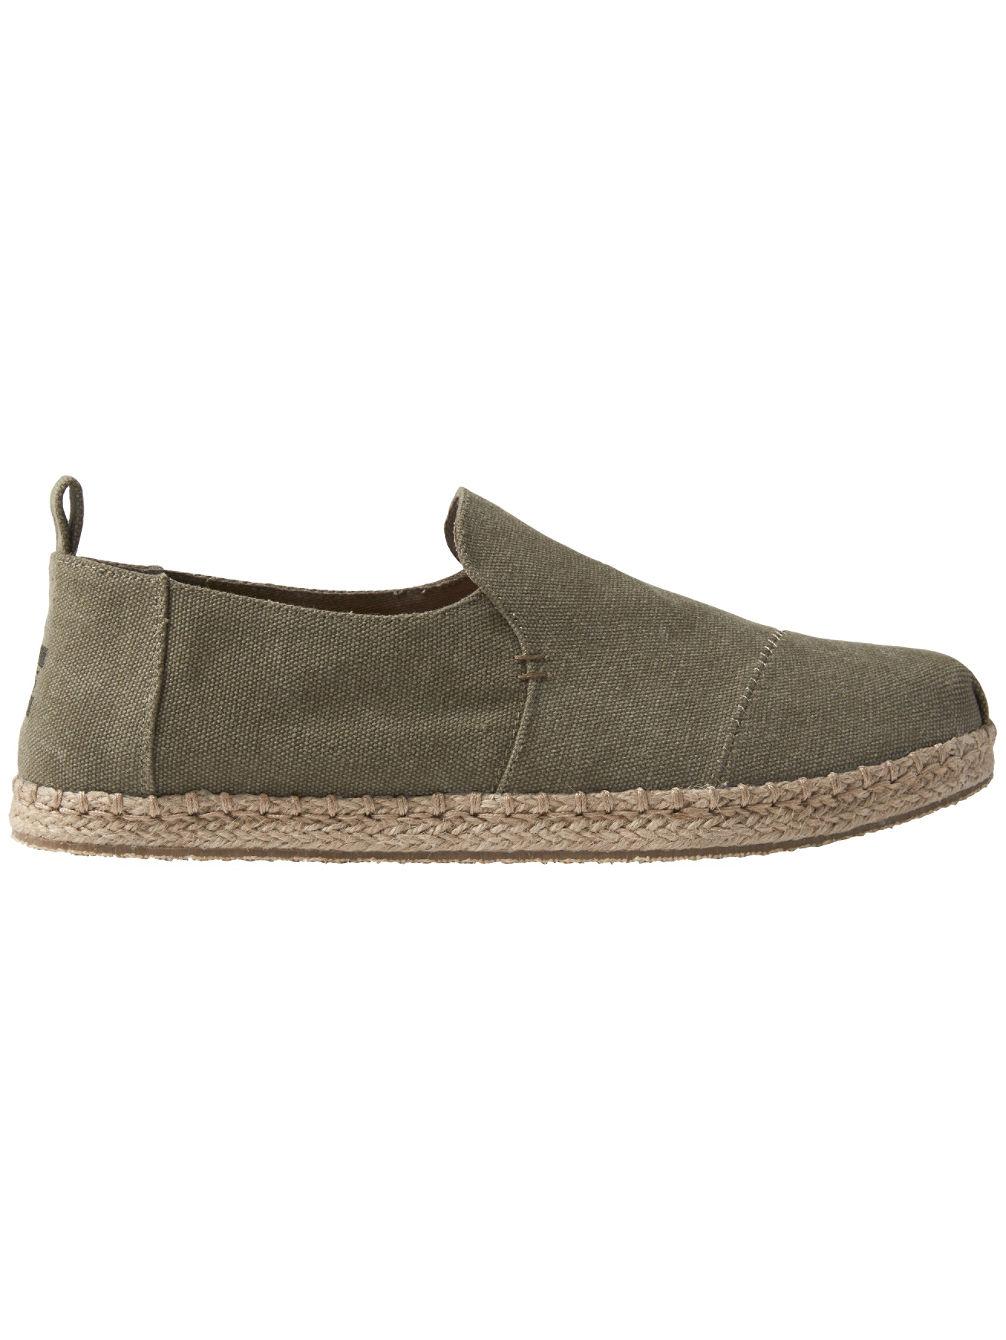 toms-deconstr-alpargata-slippers